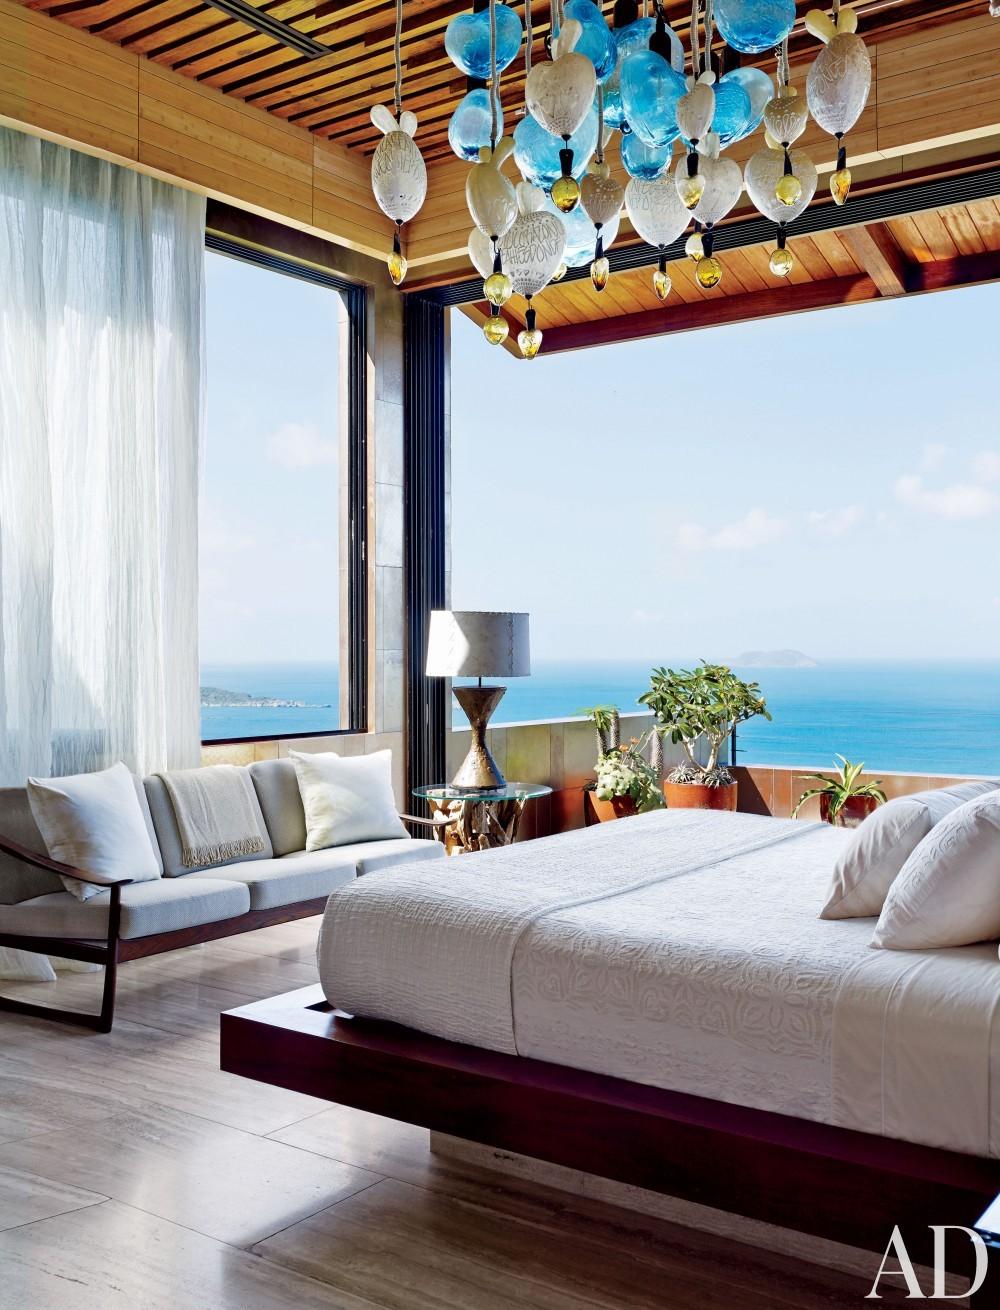 Contemporary Bedroom by Tony Ingrao and Randy Kemper in St. John, U.S. Virgin Islands